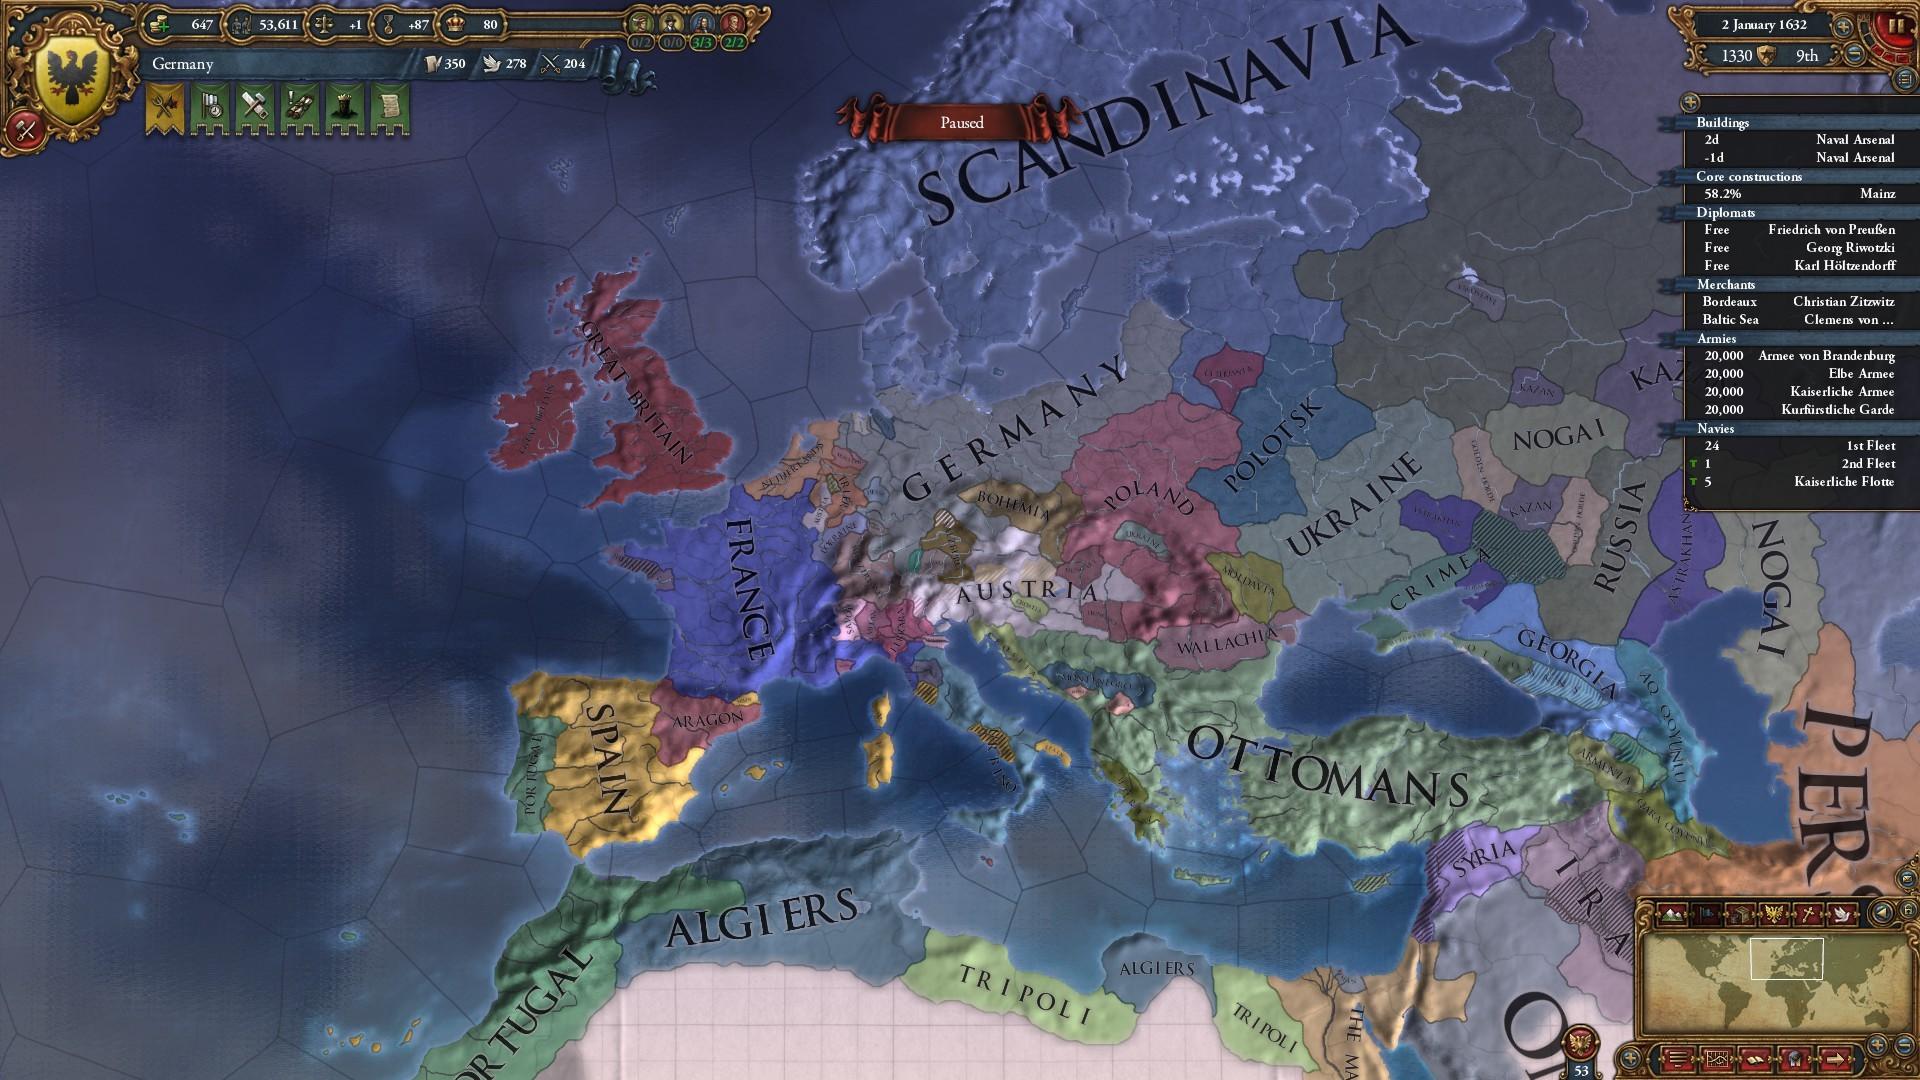 NeoGAF - Europa Universalis IV |OT| A Game of Blobs